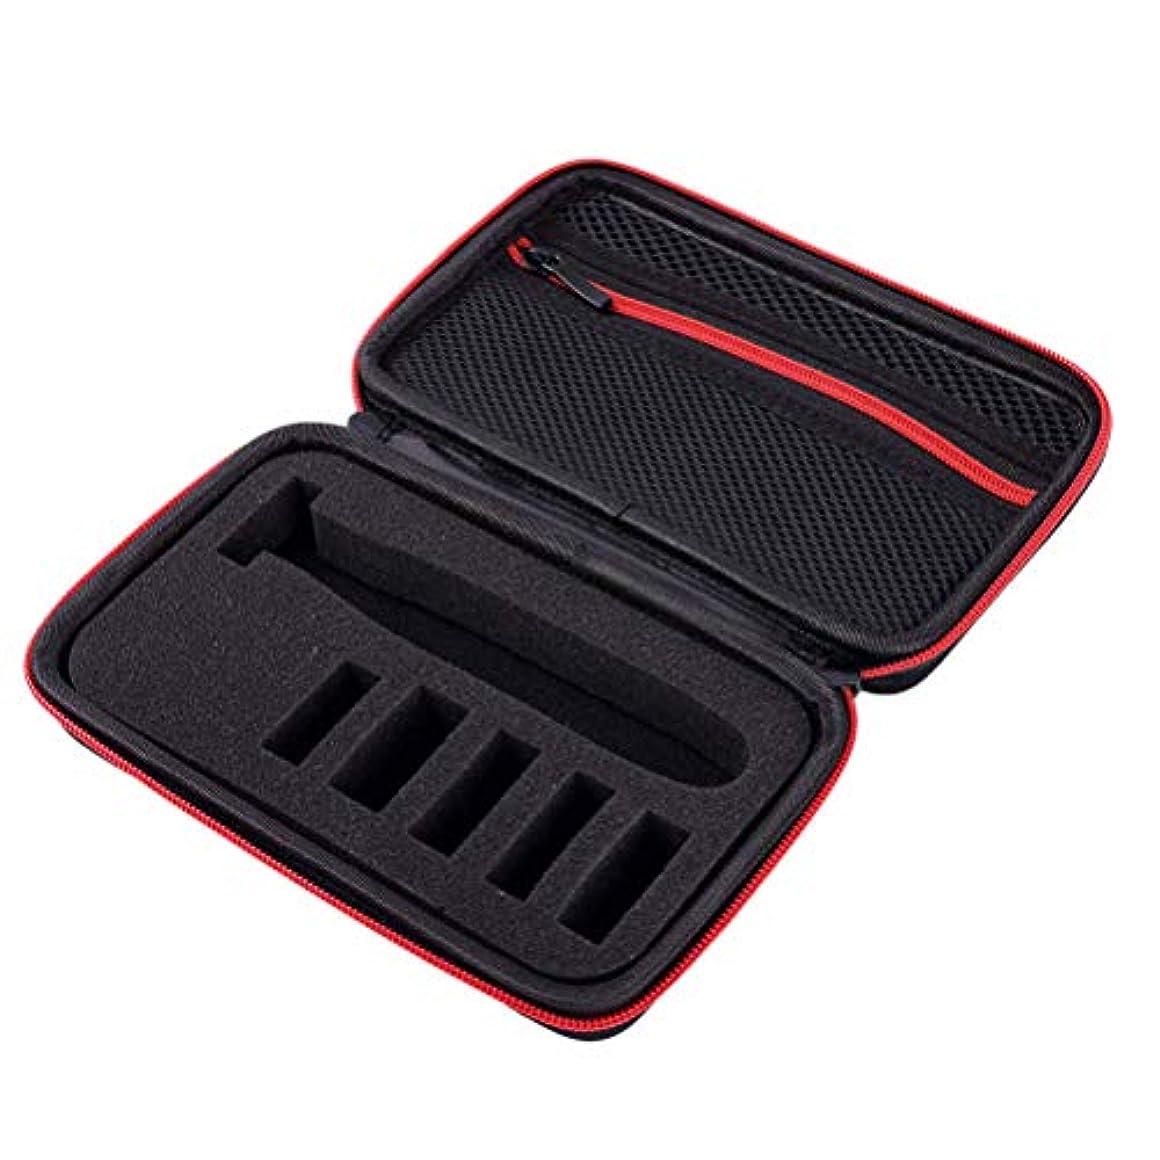 Semoic シェーバーケーストラベル電気シェーバー収納オーガナイザー キャリングバッグ(レッドジッパー、モデルQp2530 / 2520に適用可能)